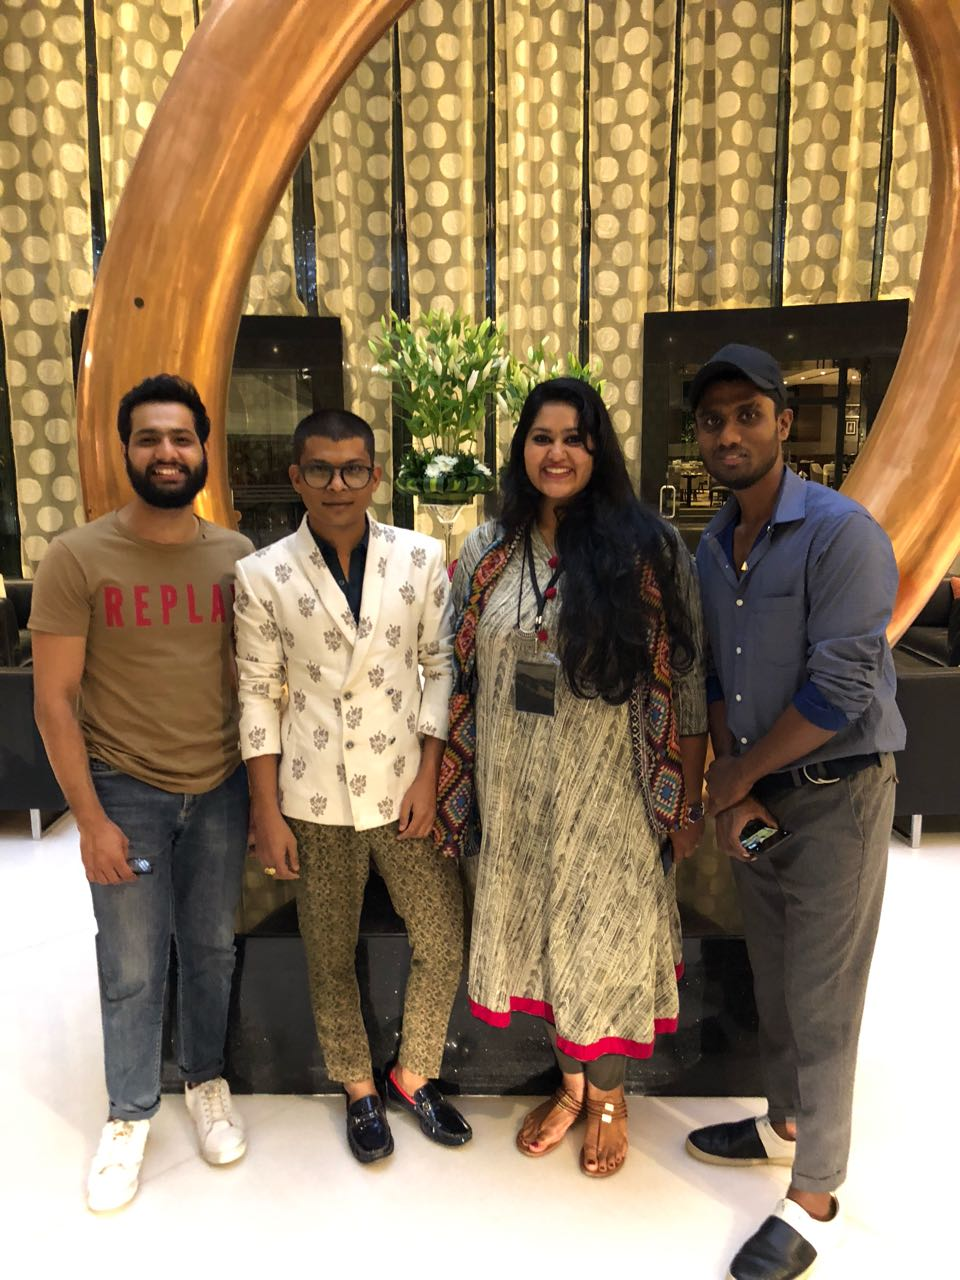 Bangalore fashion week 2018 bangalore fashion week JEDIIIANS AT WORK; BANGALORE FASHION WEEK 2018 JEDIIIANS AT WORK BANGALORE FASHION WEEK 2018 1